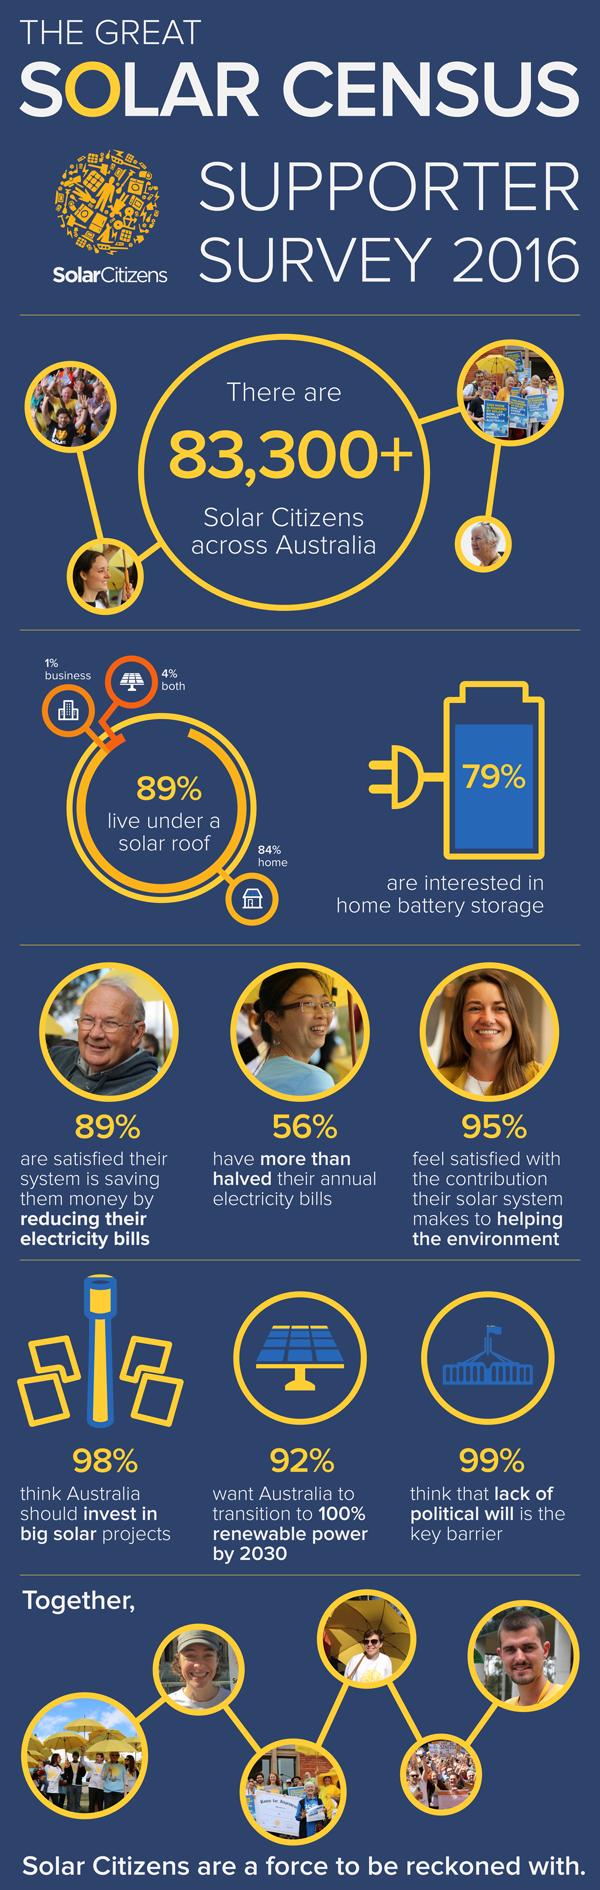 SC-2016-survey-infographic.png